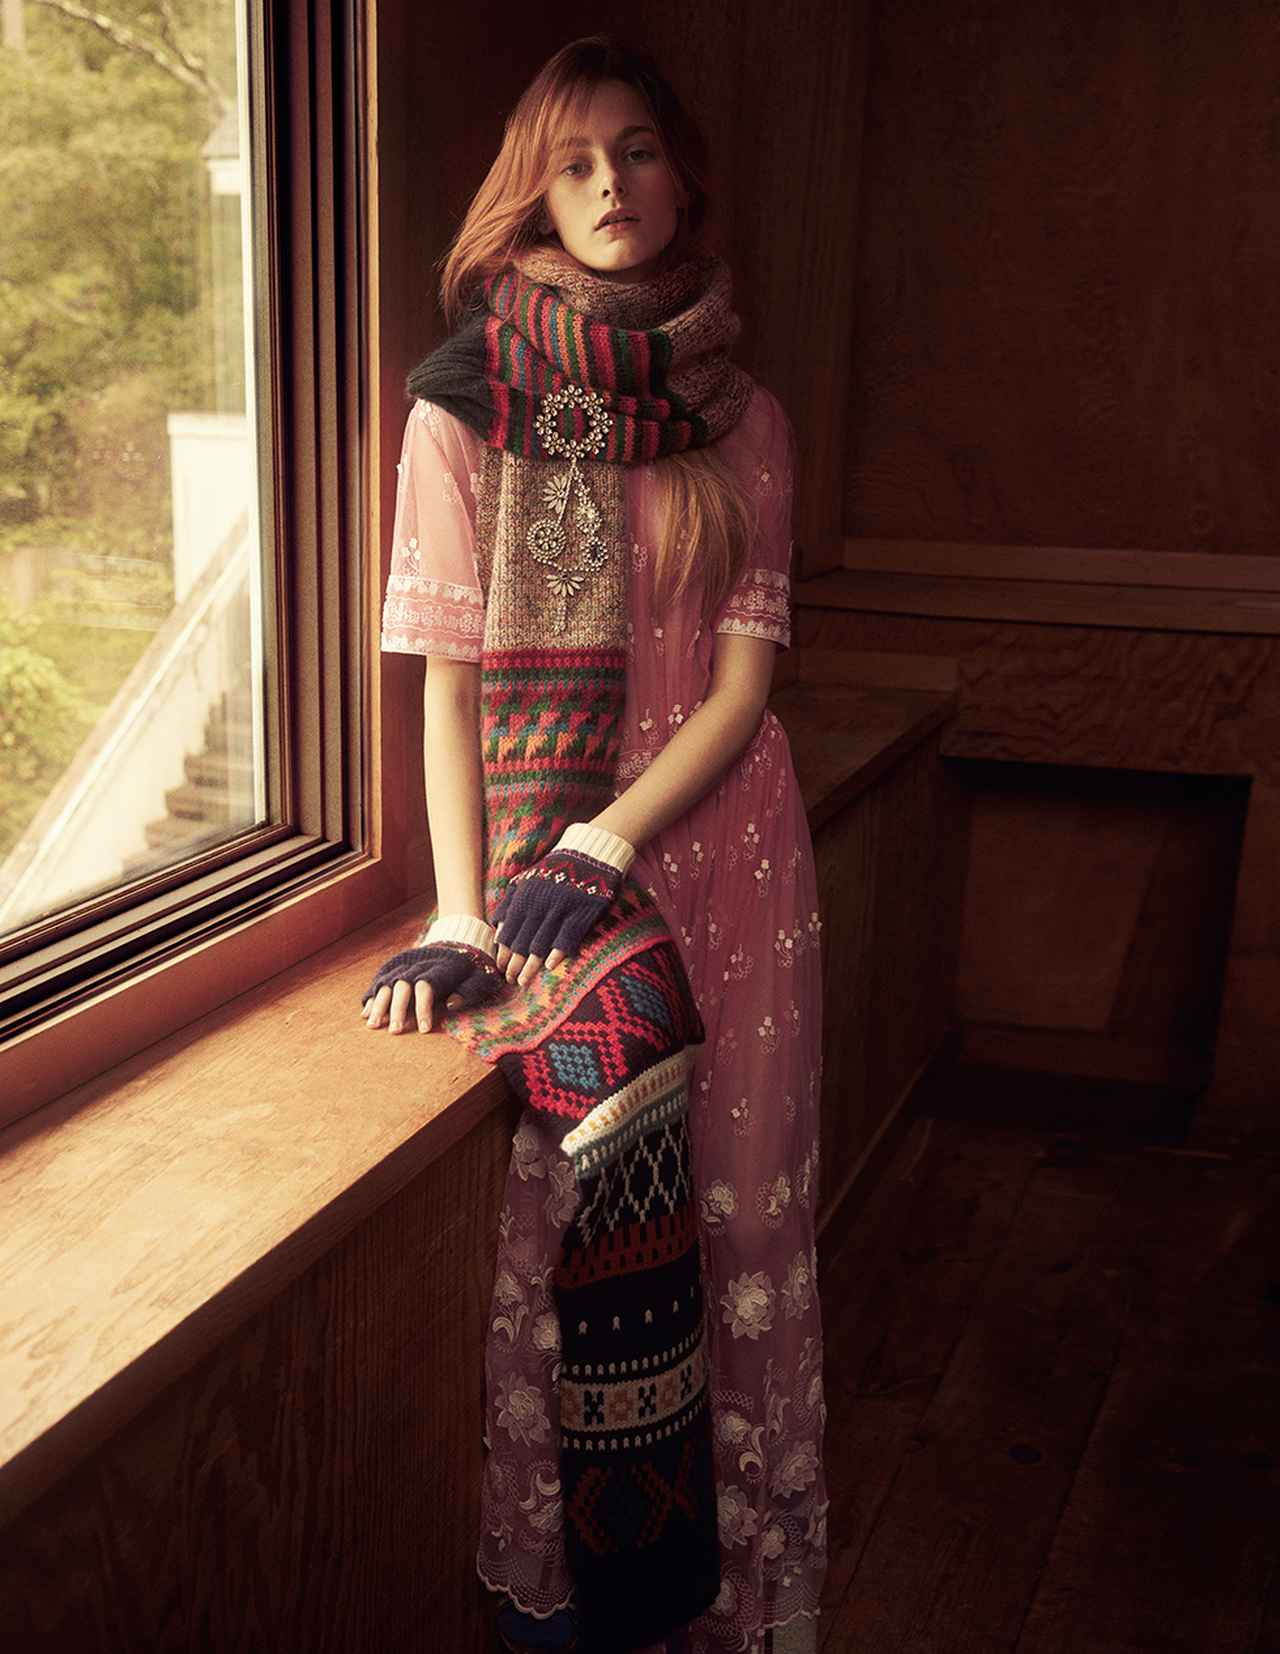 Images : 1番目の画像 - 「冬の陽だまり、まどろみの午後」のアルバム - T JAPAN:The New York Times Style Magazine 公式サイト